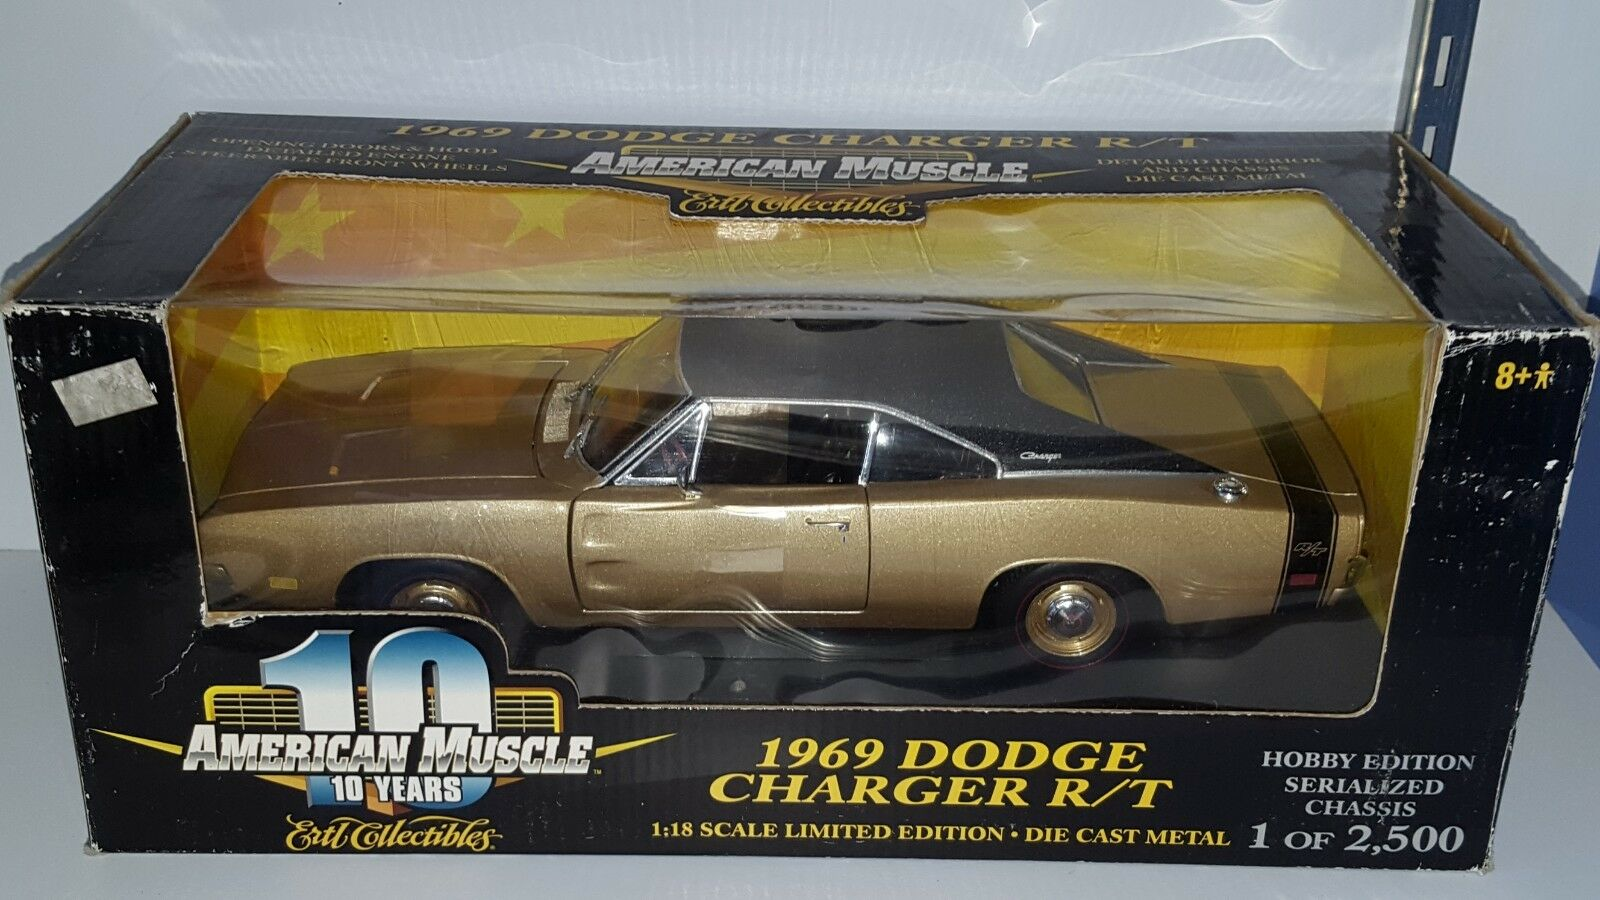 1 18 ERTL ERTL ERTL AMERICAN MUSCLE 1969 DODGE CHARGER R T YELLOW gd 2024c3